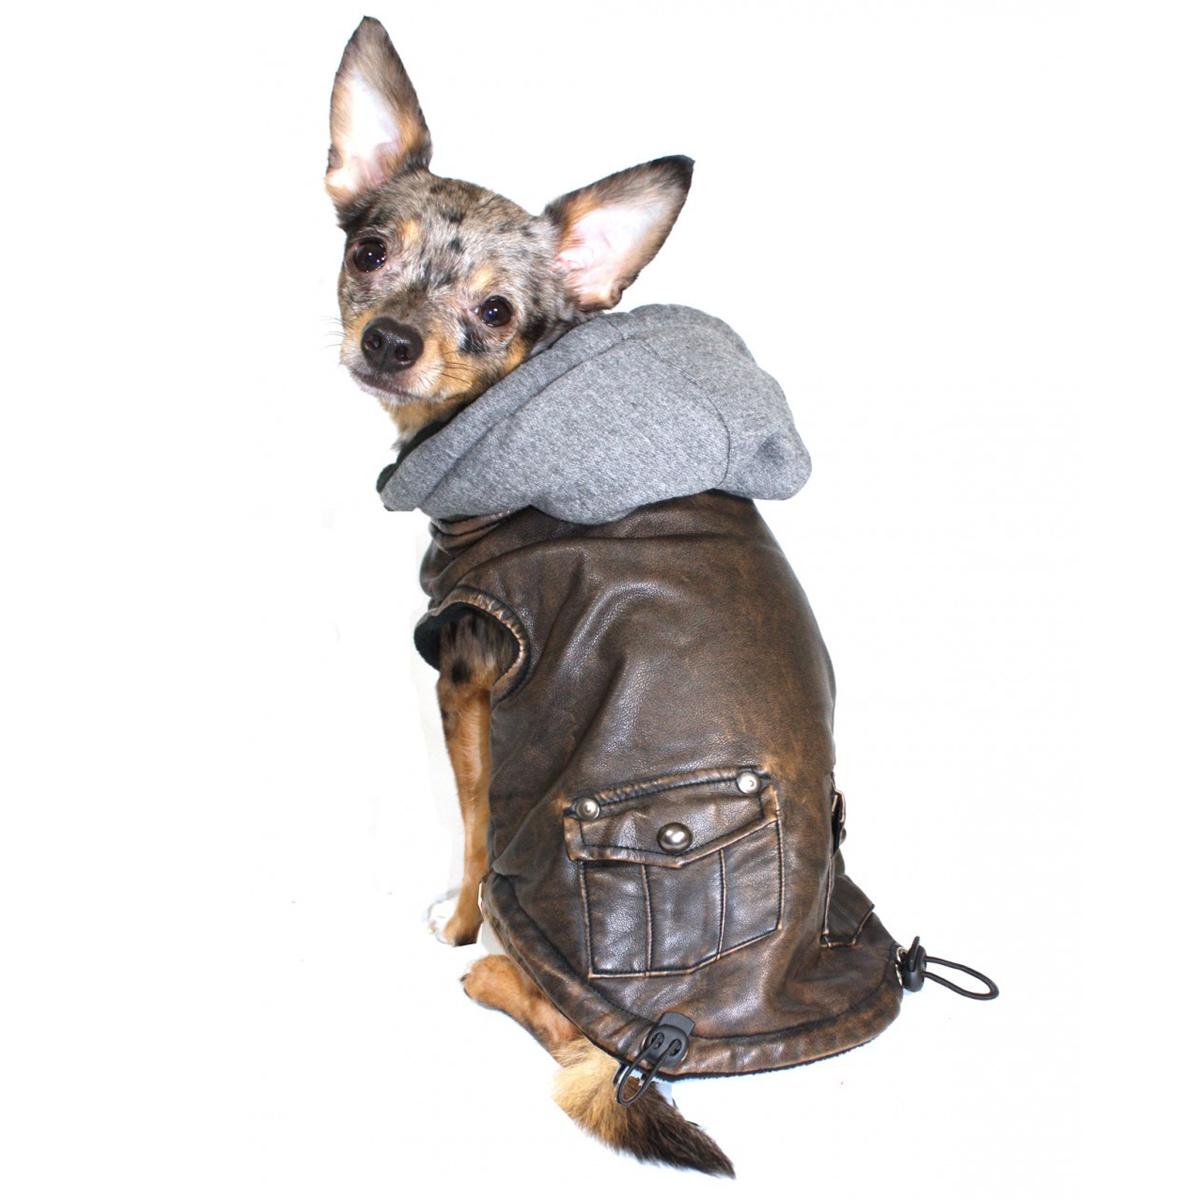 Vintage Bomber Dog Jacket by Hip Doggie - Gray Hood